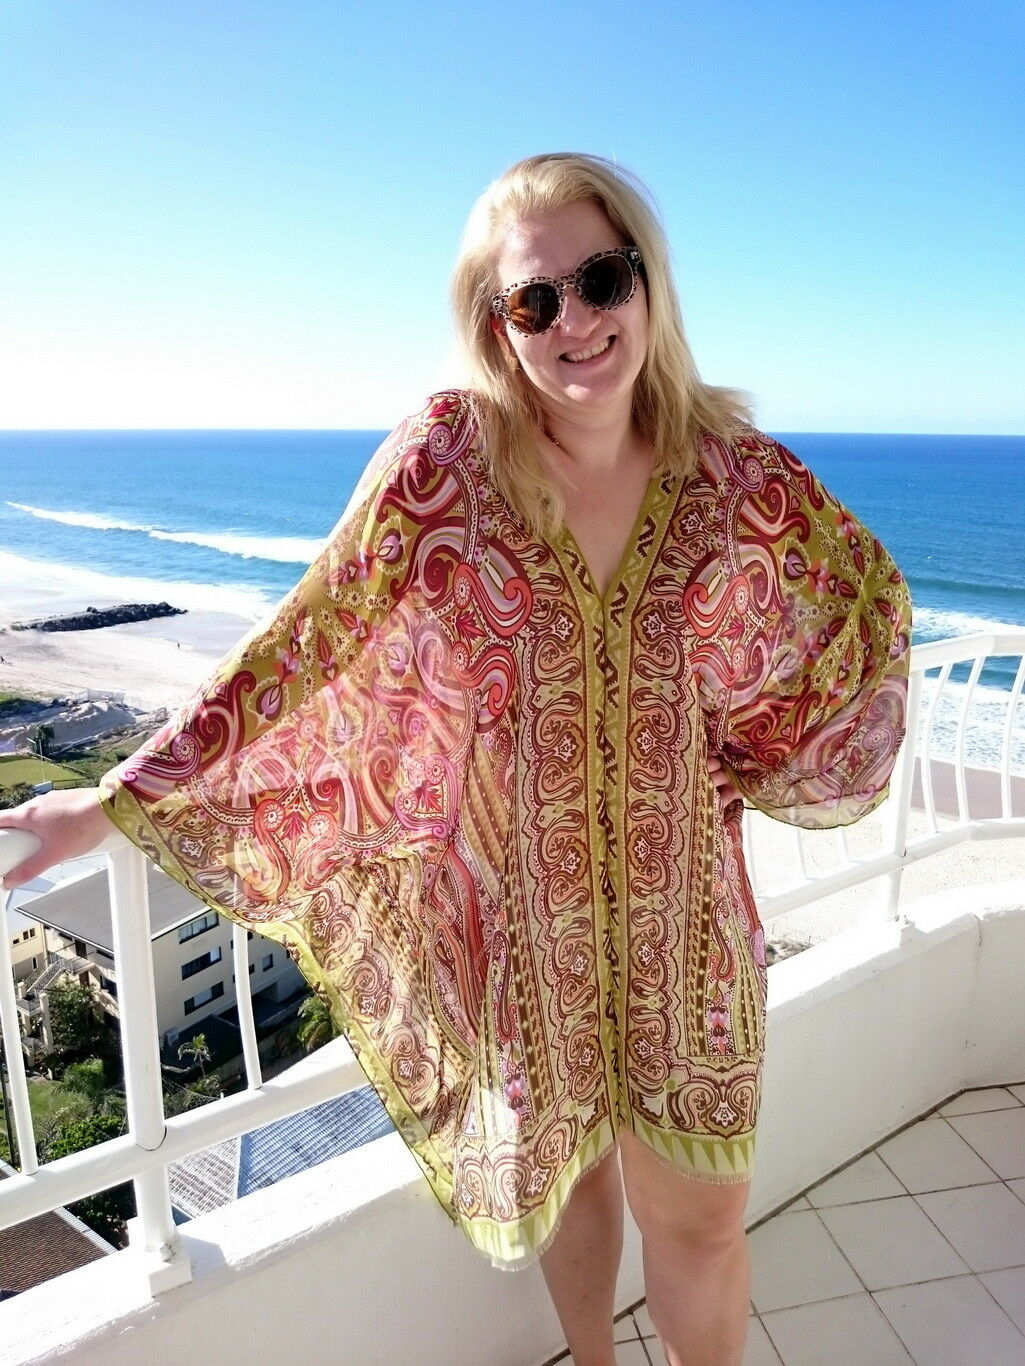 Plus Größe Silk Kaftan Top Beach Coverup Paisley Stylish Resort Cruise wear Grün